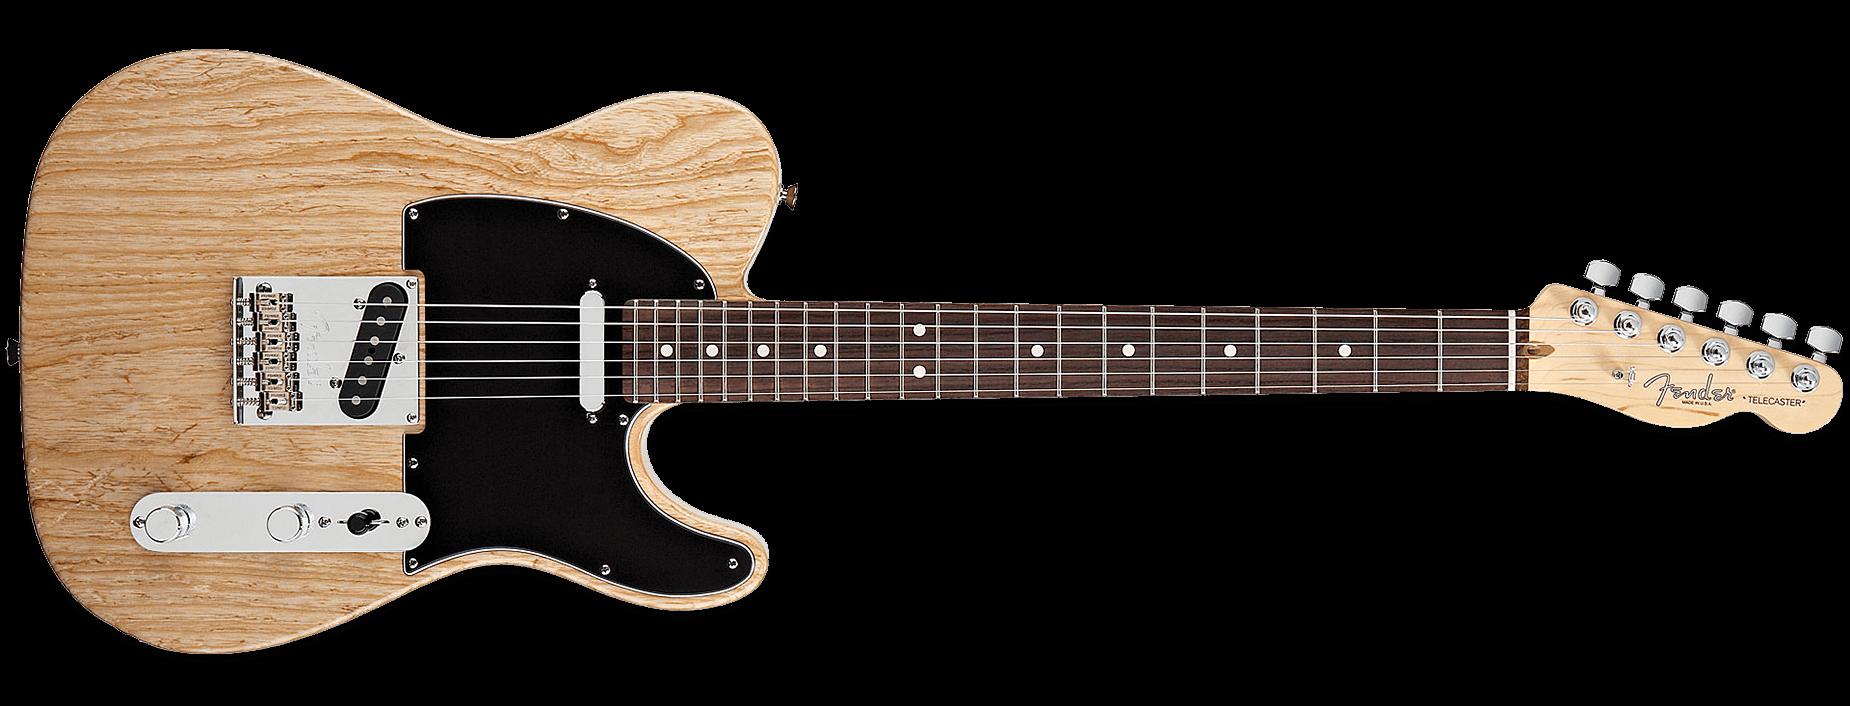 Fender American Standard Telecaster 2012 Natural